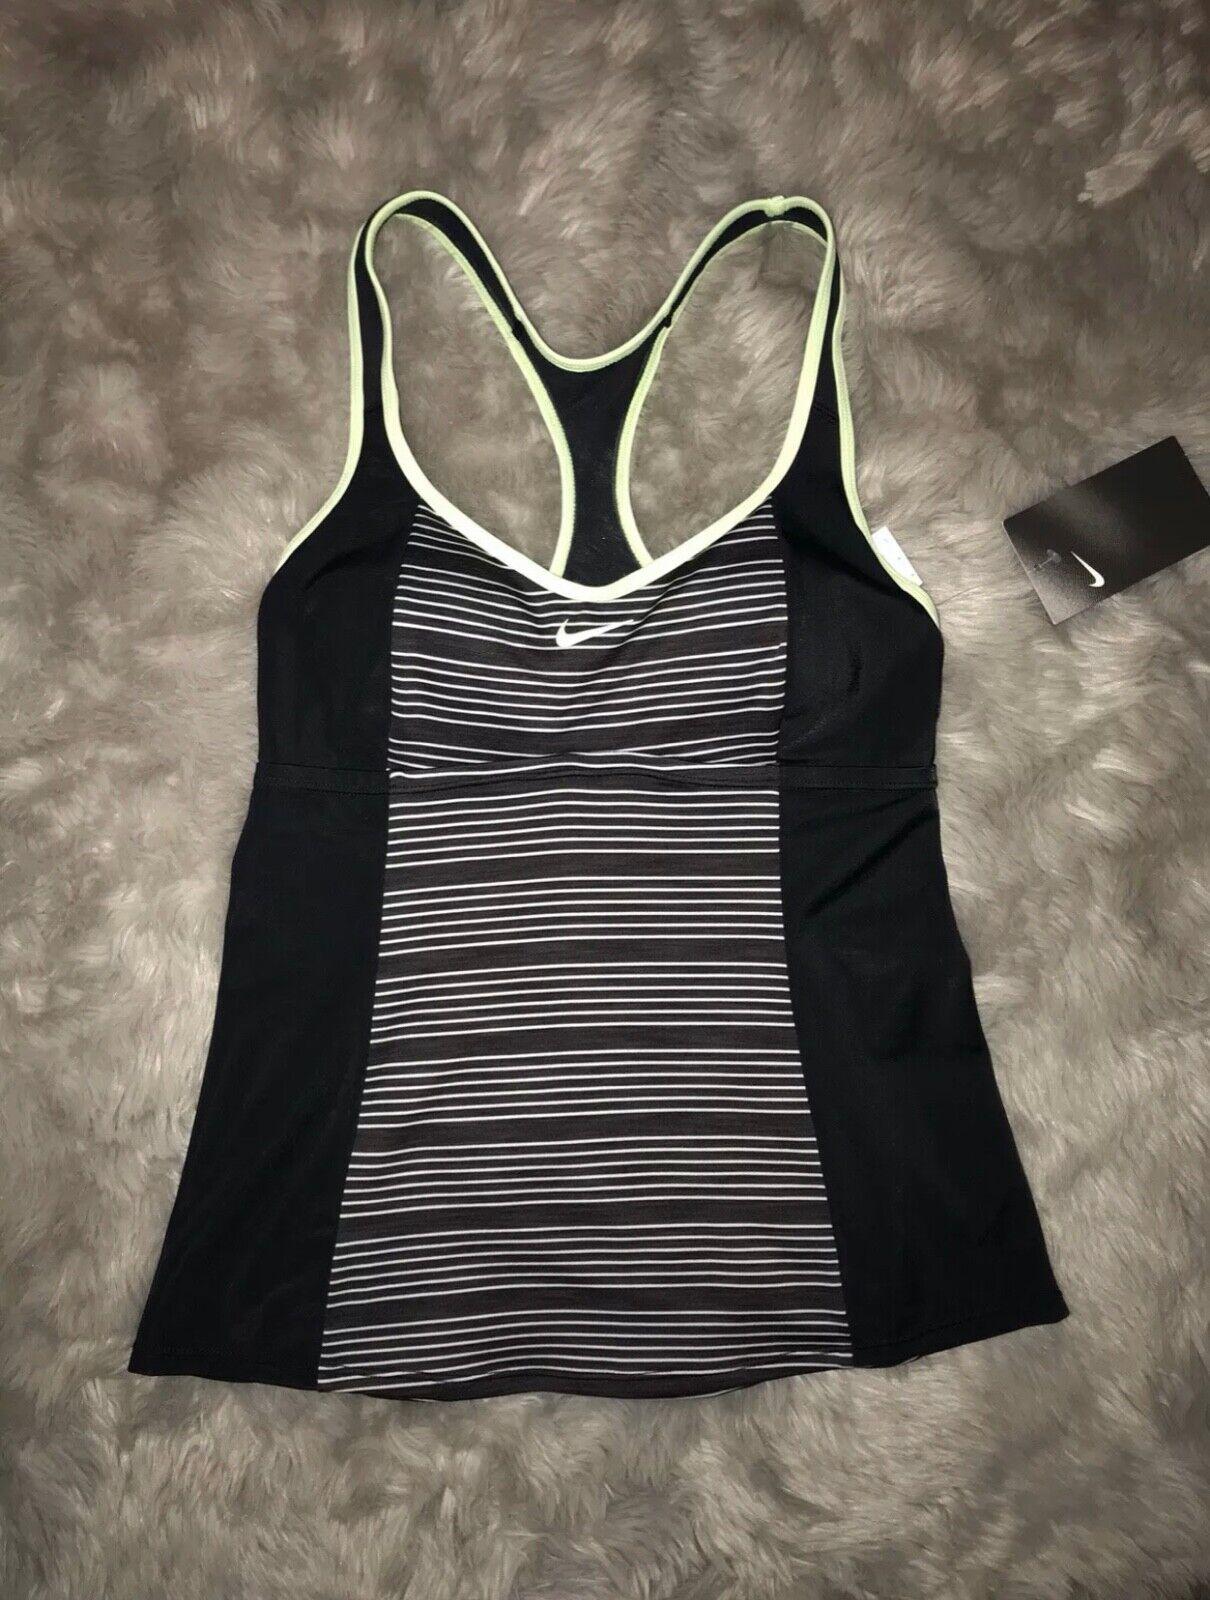 Nike Blue Striped Racerback Tankini Top Swimwear Women/'s Small,Medium #KO15062